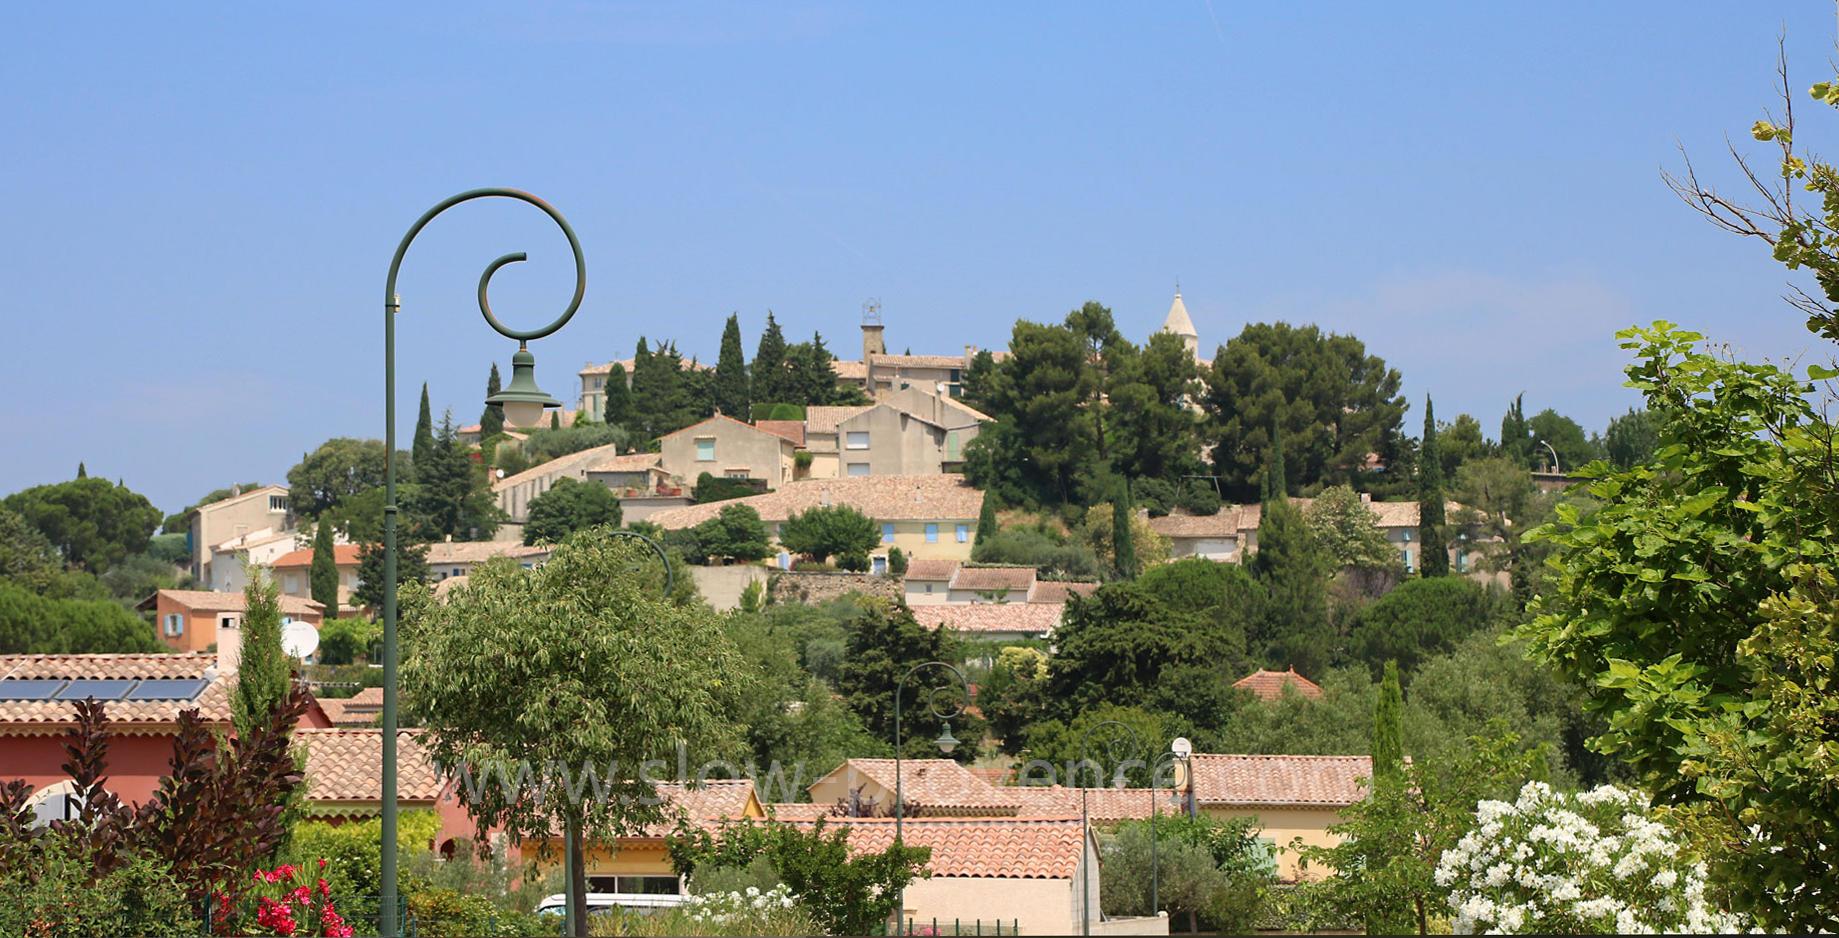 Cairanne, provençal village and Côte du Rhône vintage wine